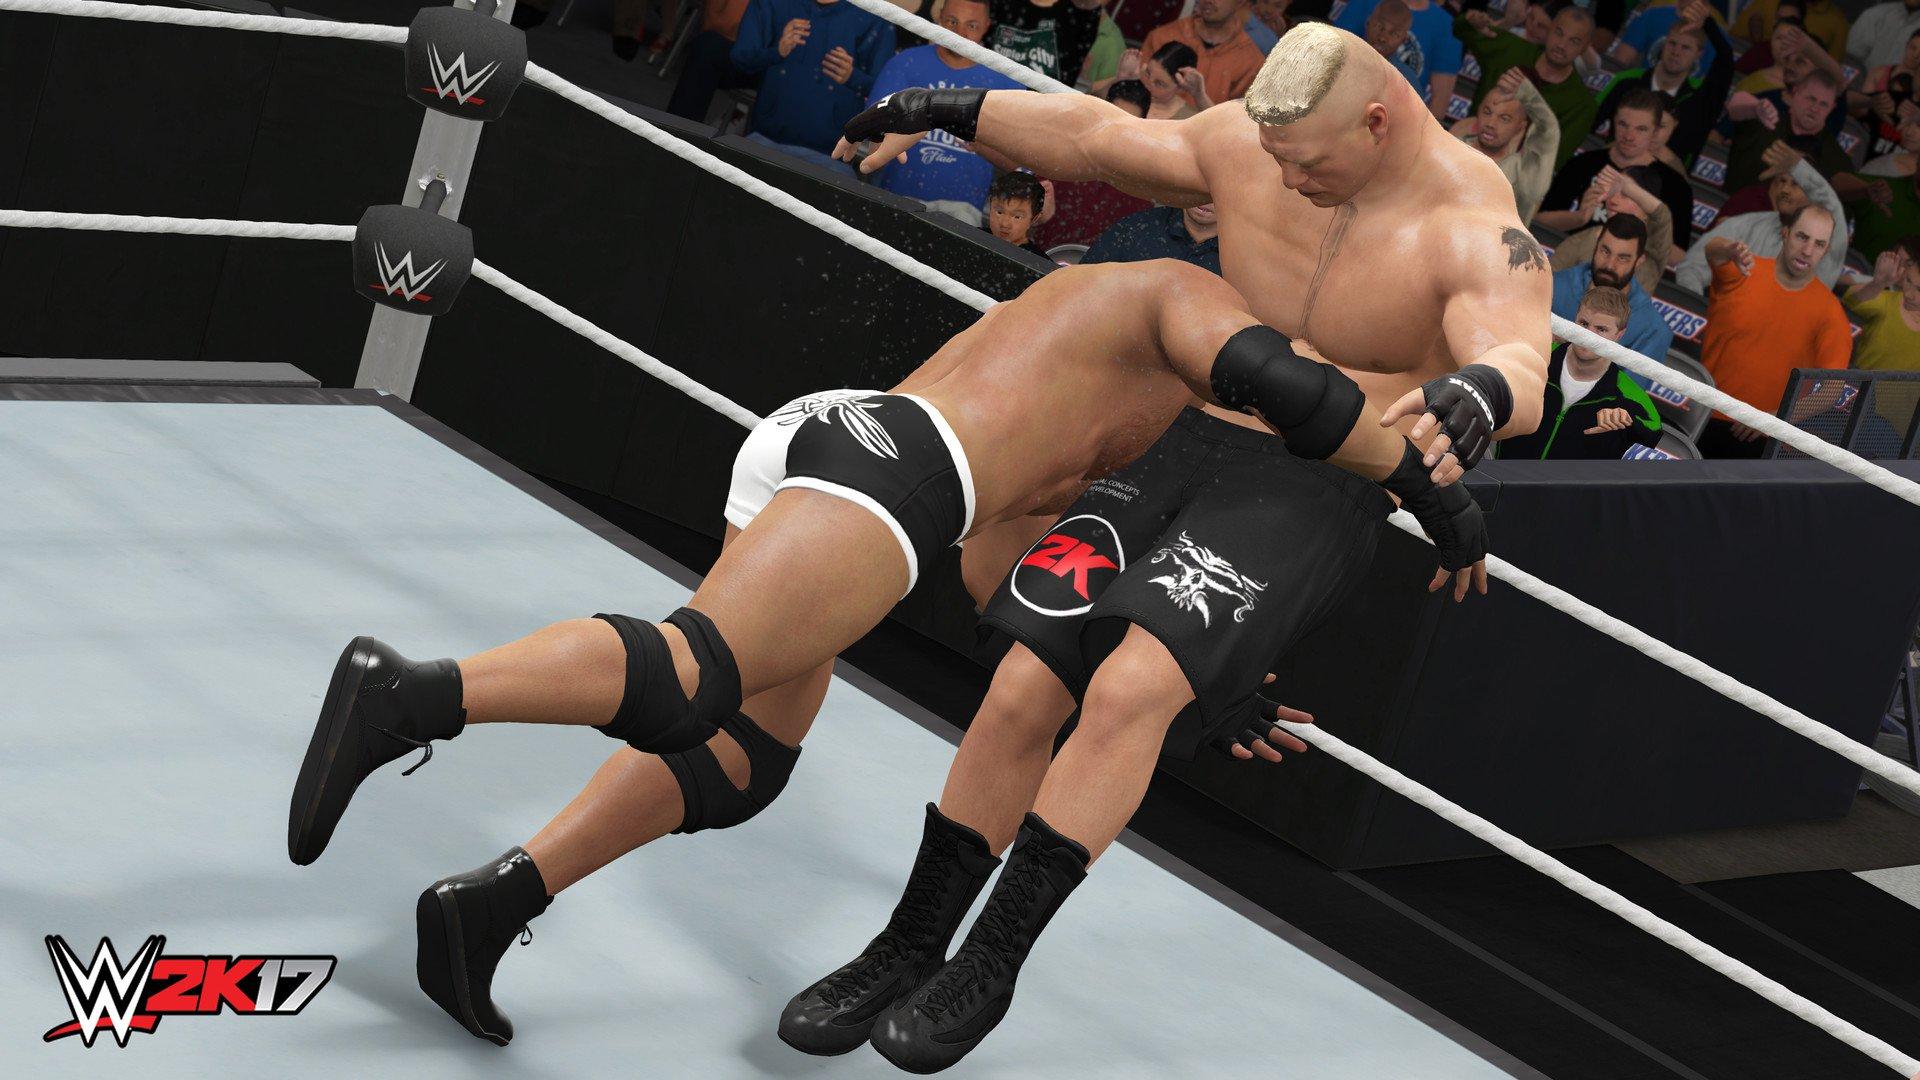 WWE 2K17 6